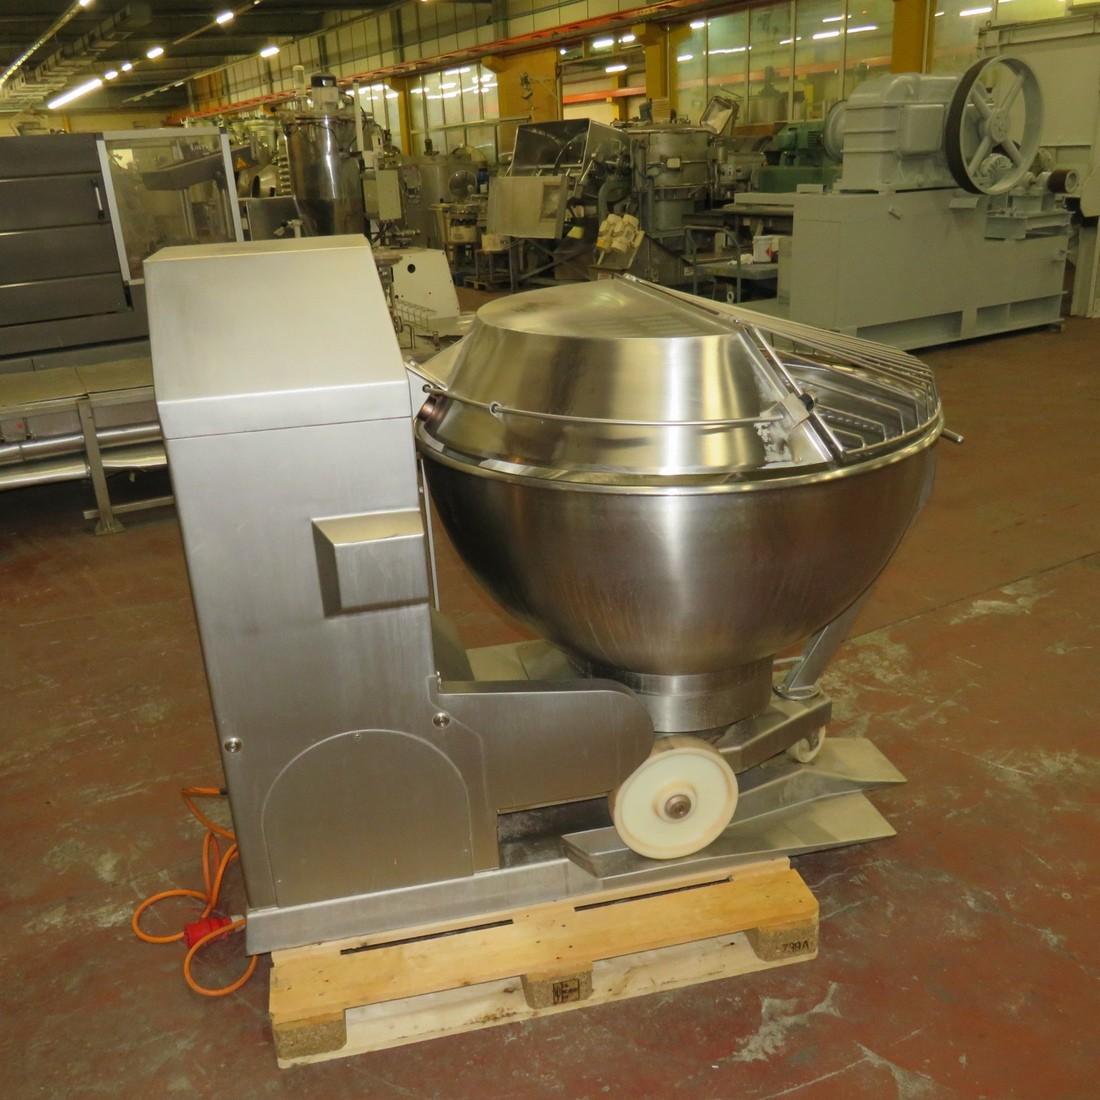 R6MP113 STORK-HERMANN WESTFALIA planetary mixer MA 400 D type capacity 400 litres